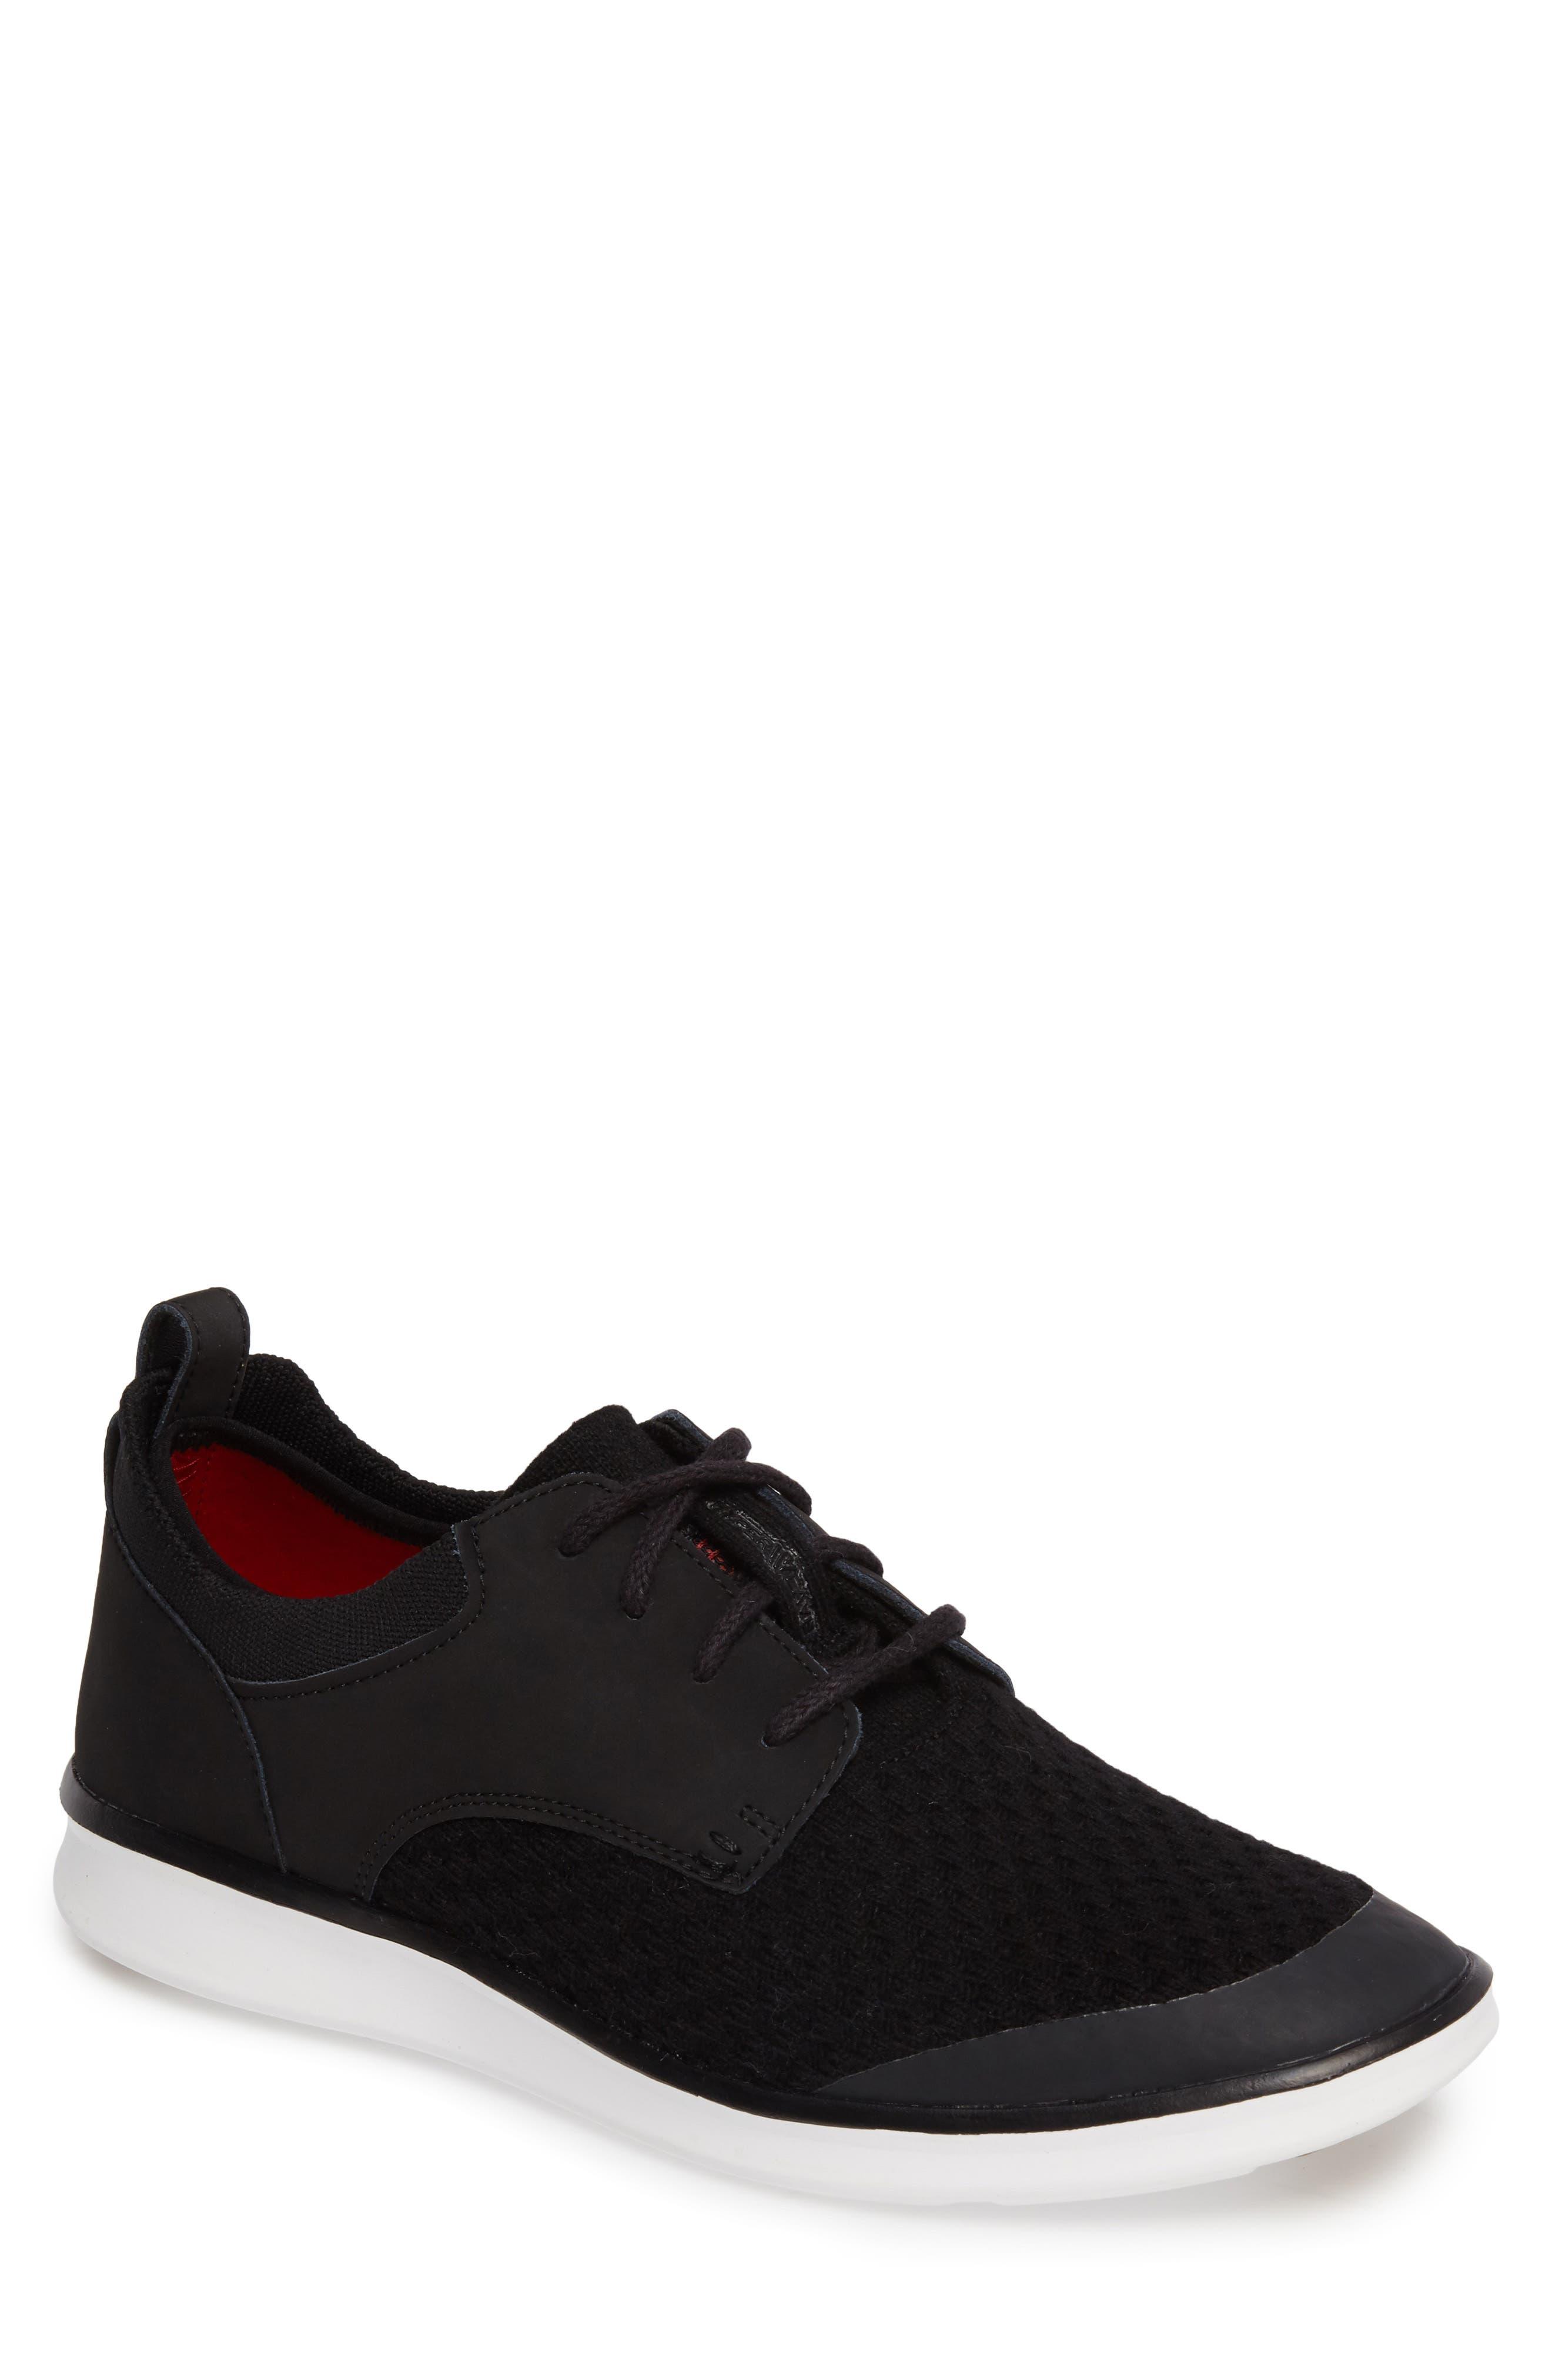 Hepner HyperWeave Sneaker,                         Main,                         color, 001